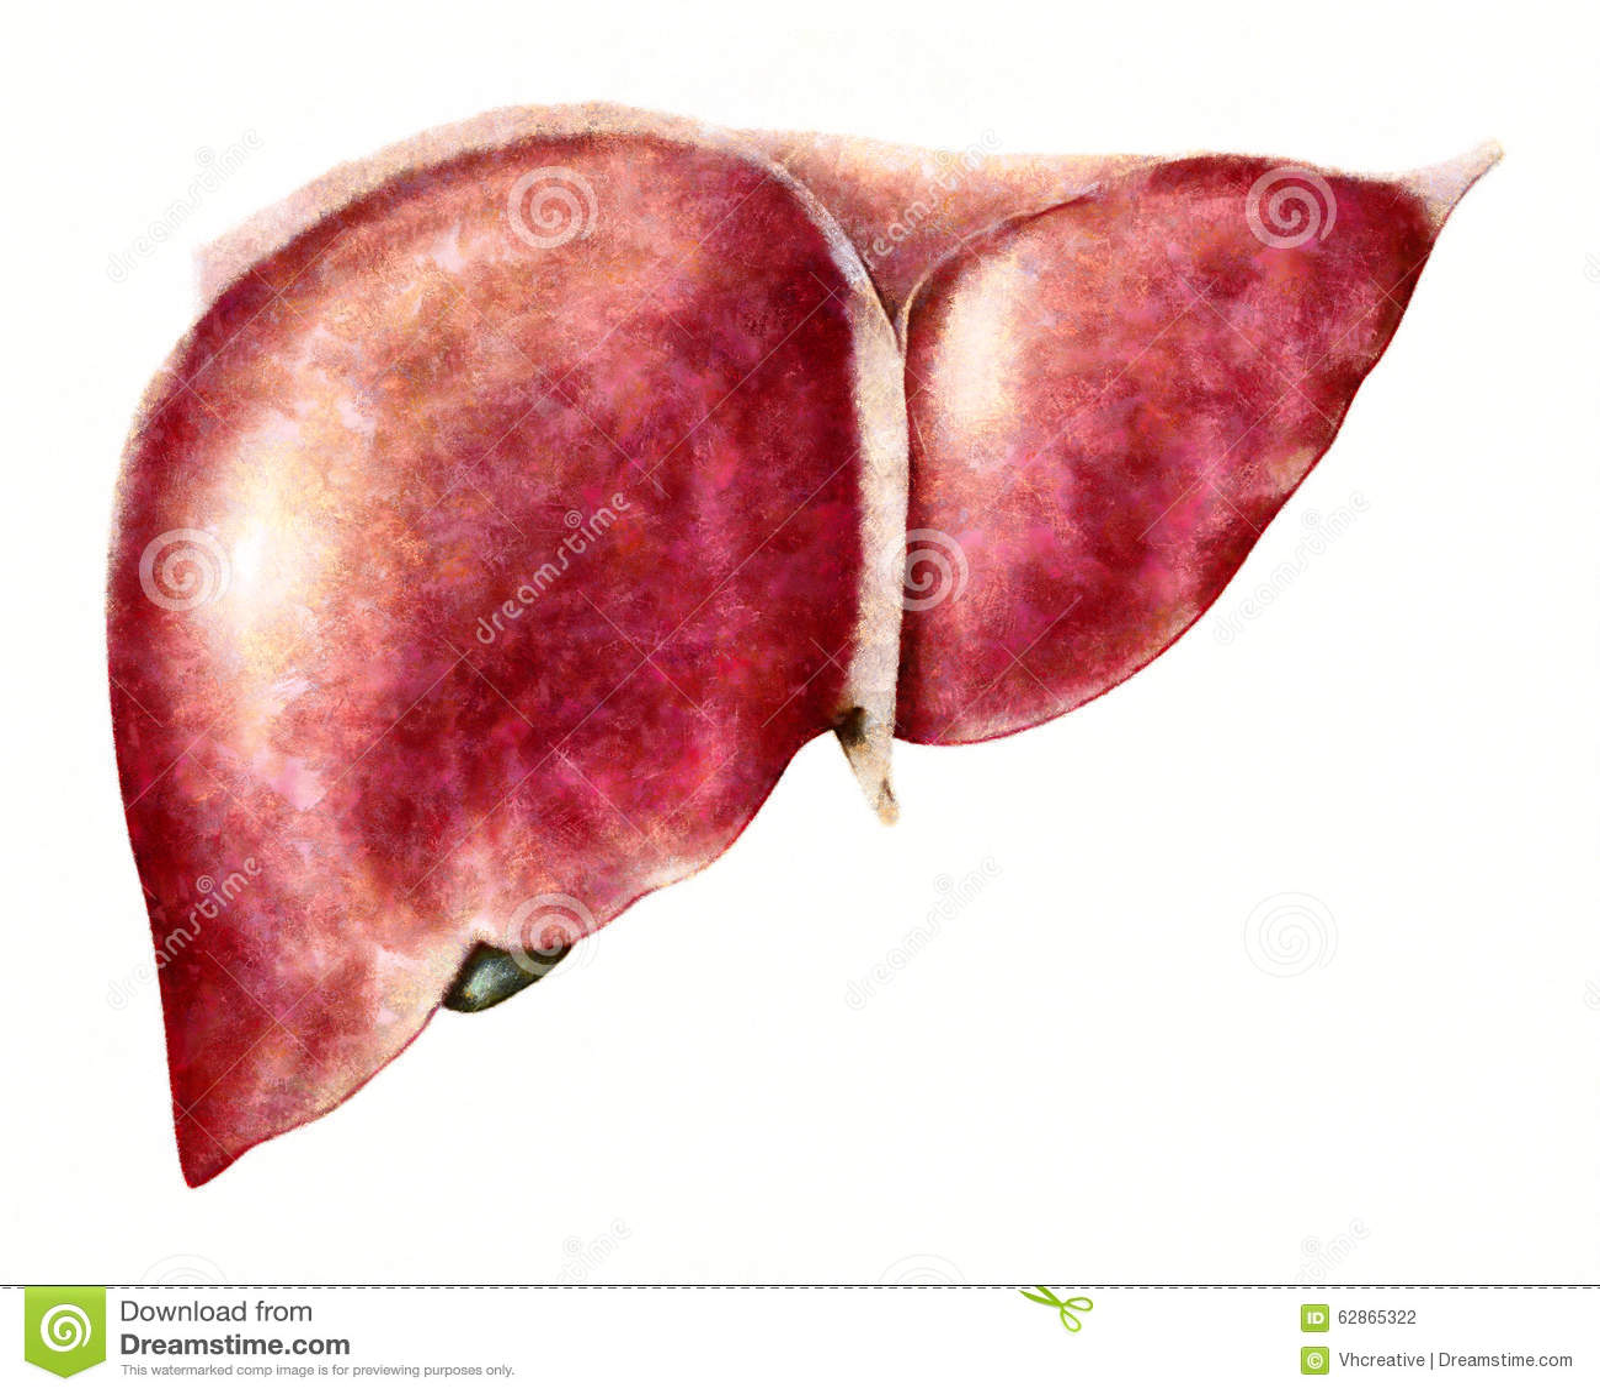 Human Liver Anatomy Illustration Stock Illustration - Illustration ...